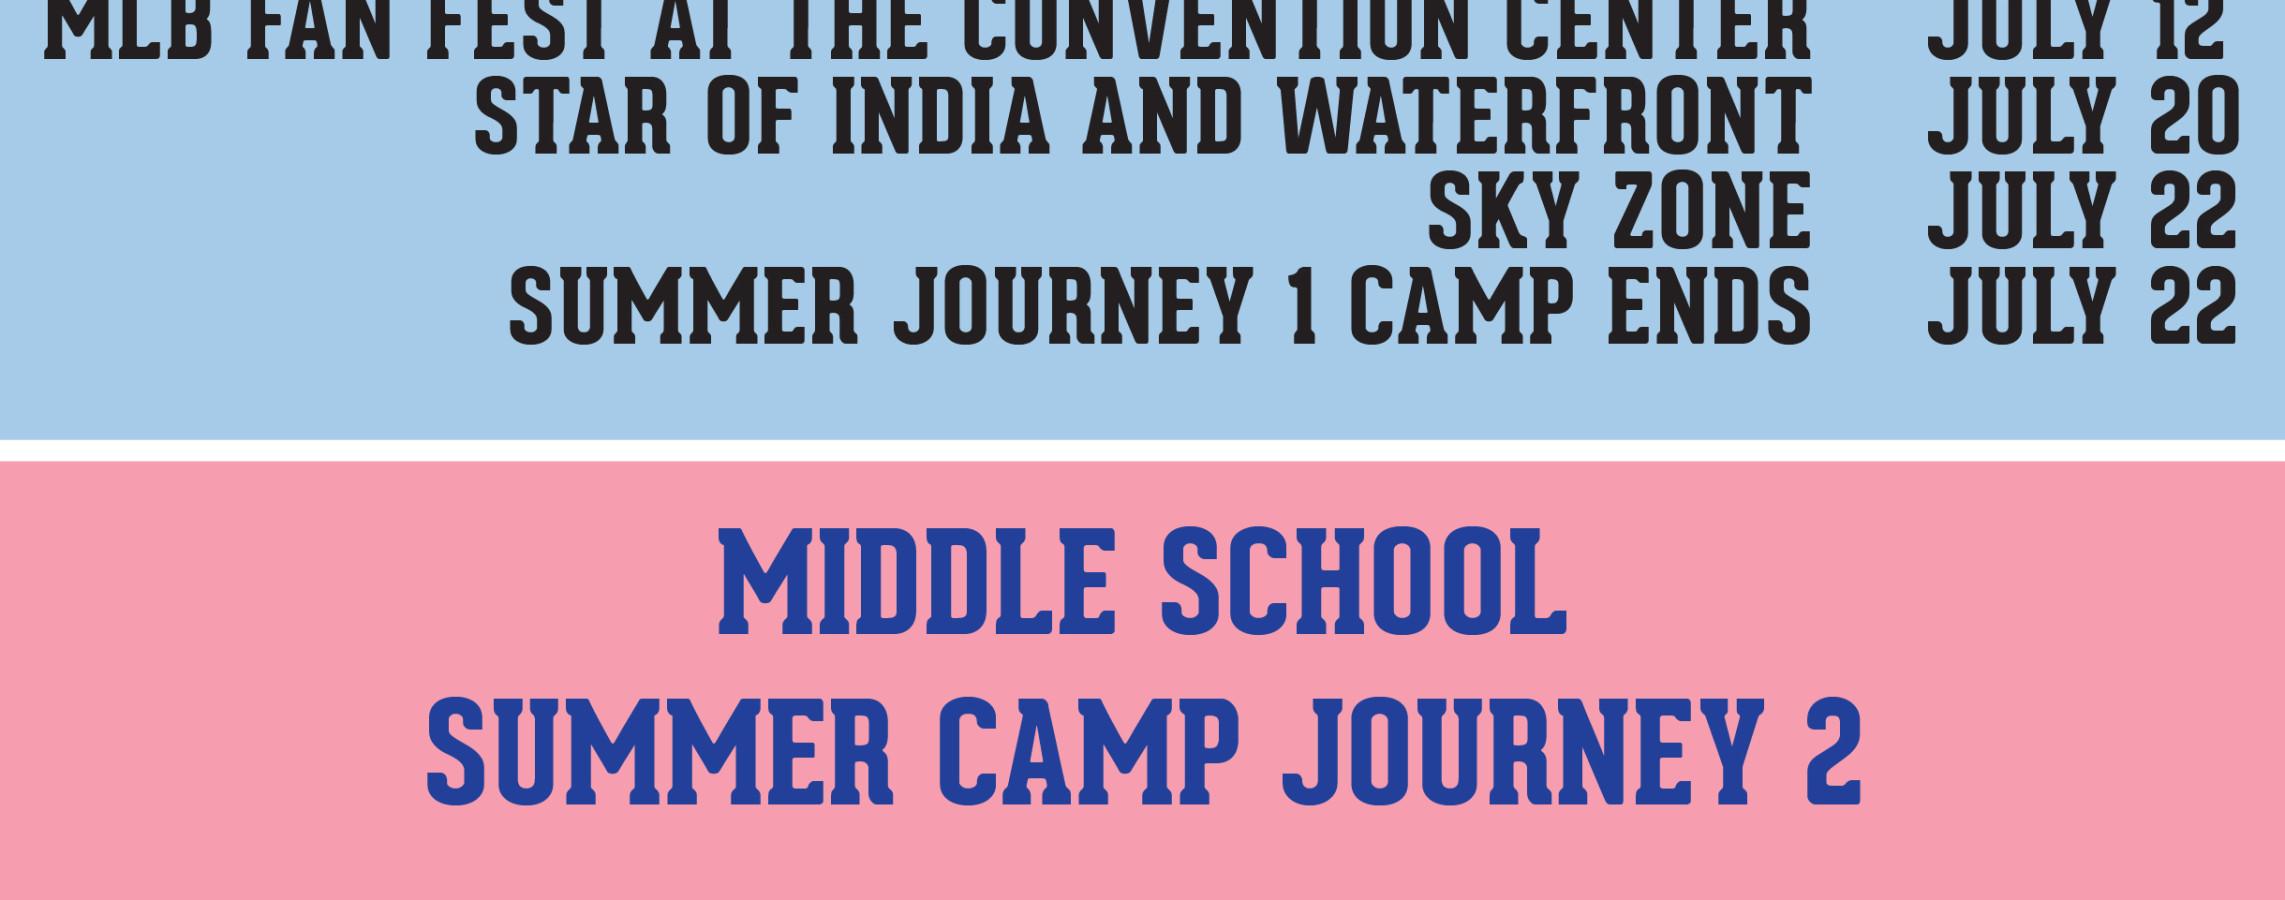 21-Jul-2016 20 18 236K Untitled-8-01-1024x9..  07-Dec-2016 12 58 216K  Summer-School-and-Ca..  05-Jul-2016 14 47 211K senior-convoc-invite. 0ef7cc9d6a6